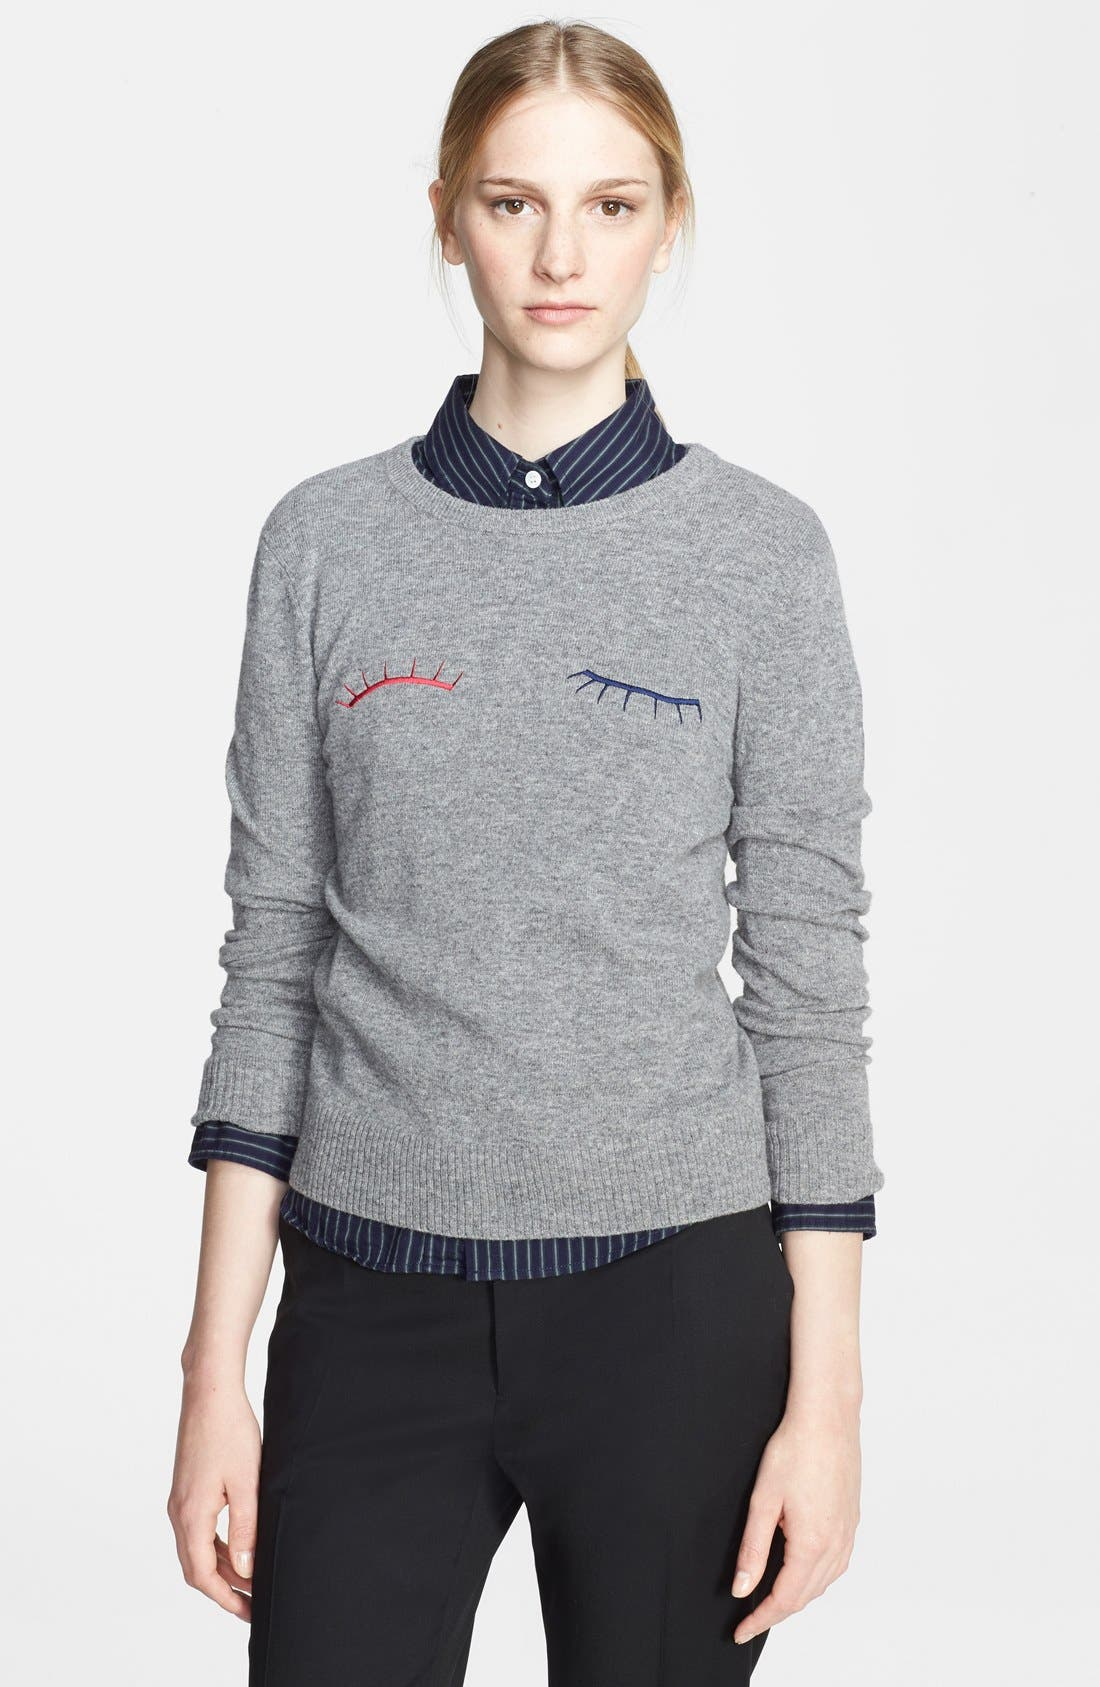 Eyelash Felted Wool Sweater,                             Main thumbnail 1, color,                             066